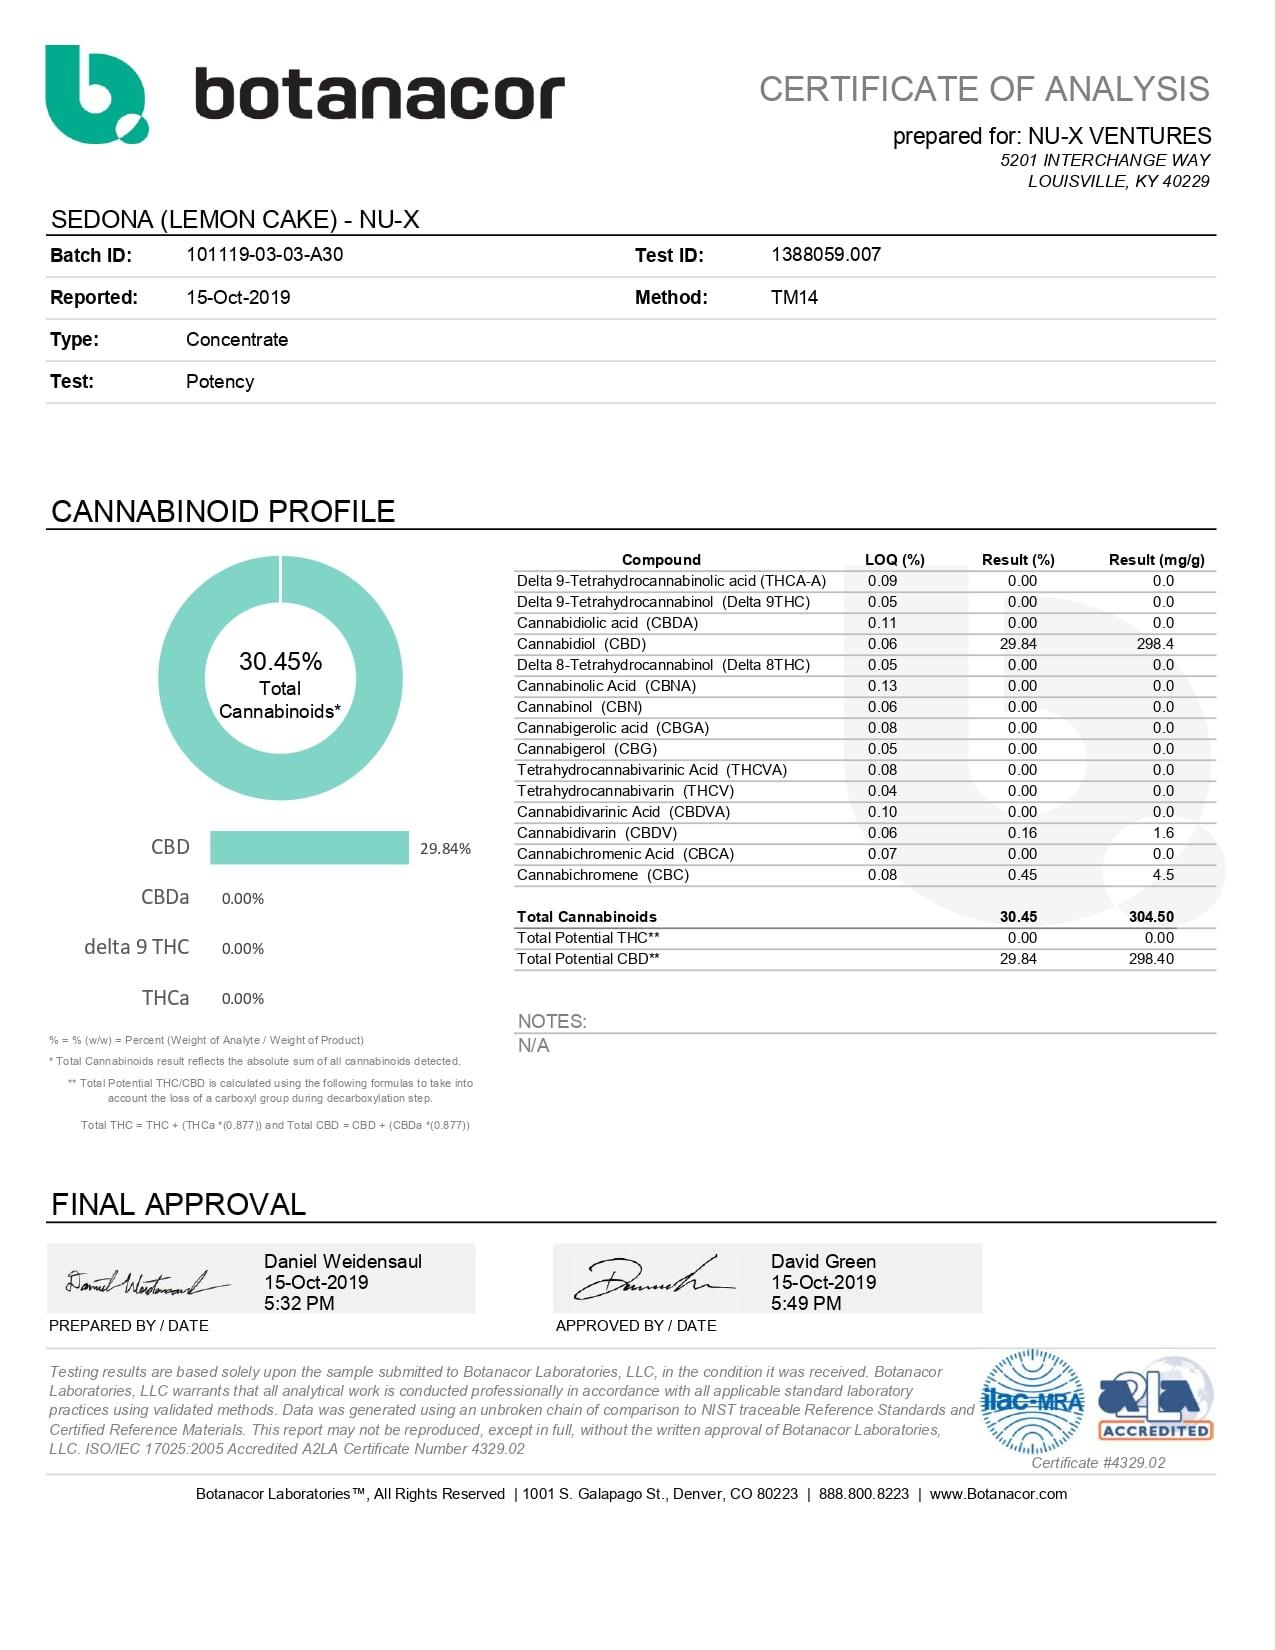 NU-X CBD Disposable Vape Pen Sedona Lab Report